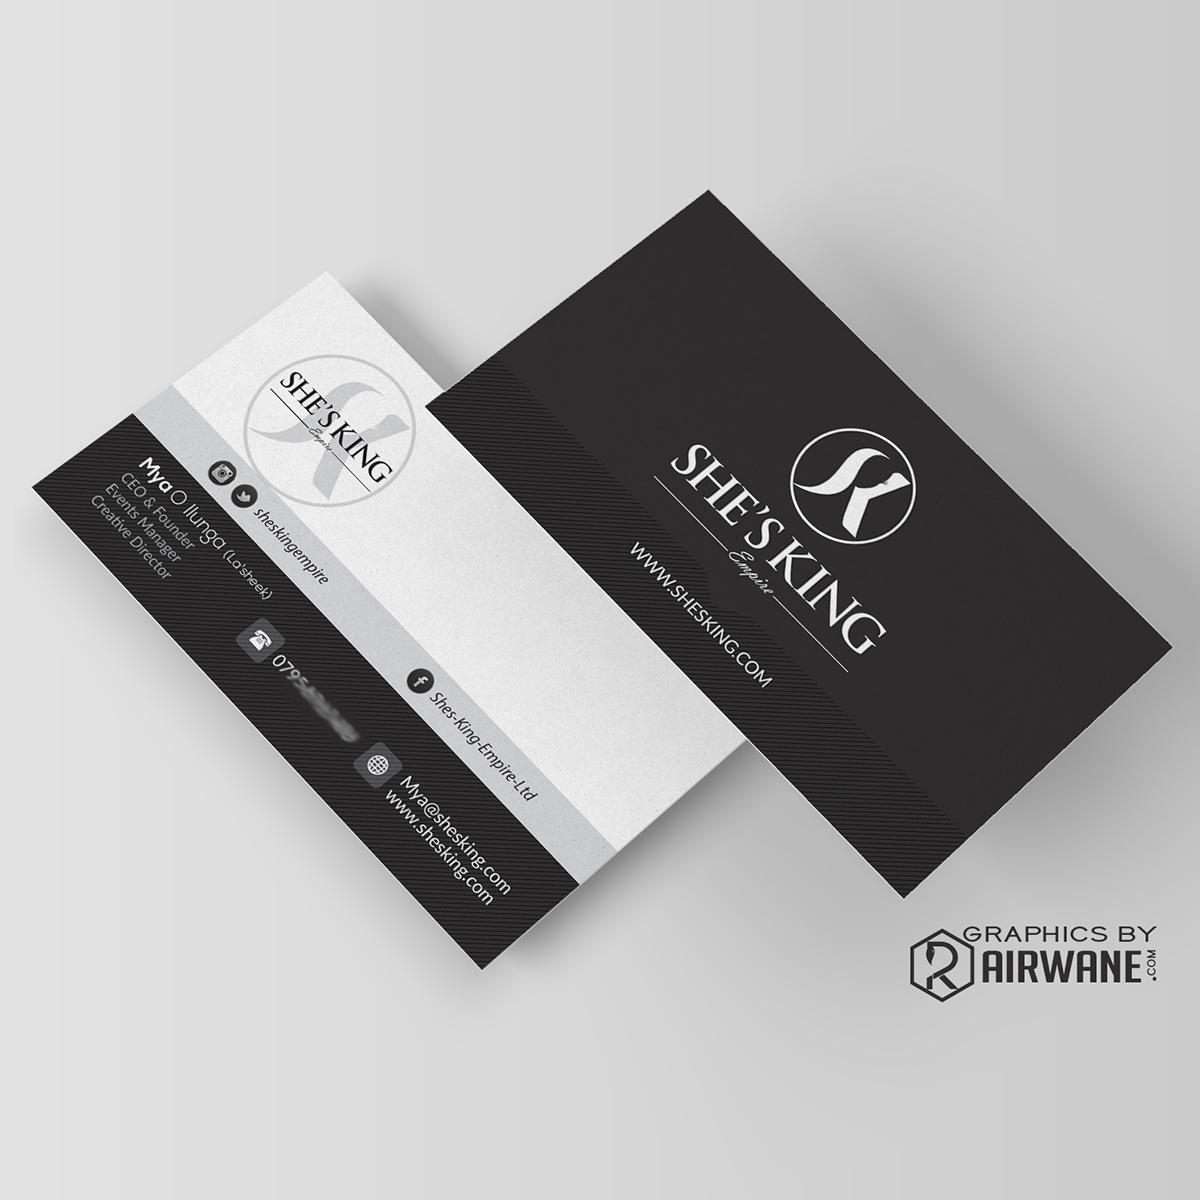 Airwane business card artwork on behance colourmoves